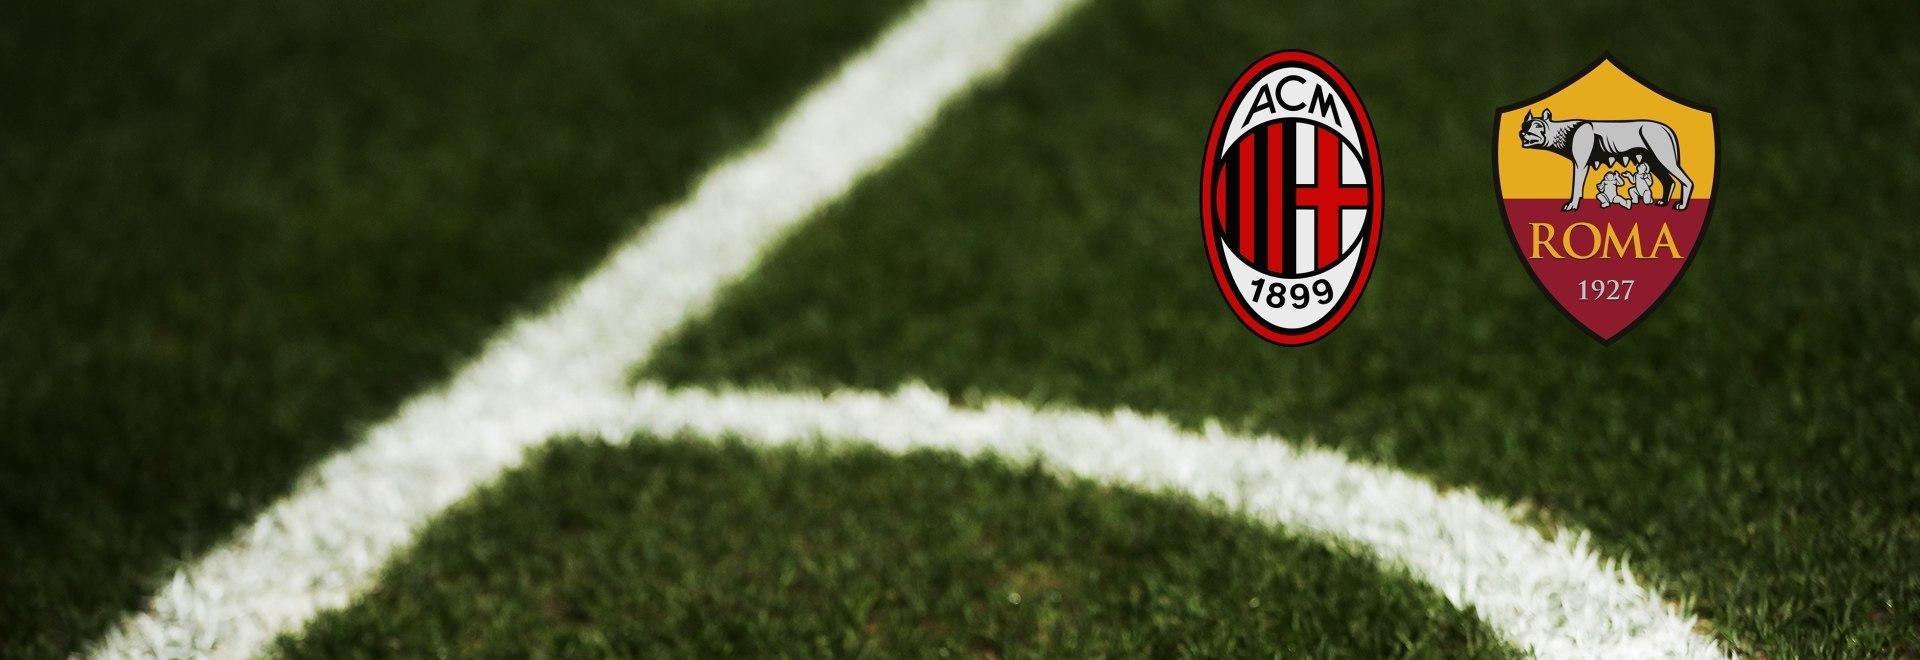 Milan - Roma. 28a g.